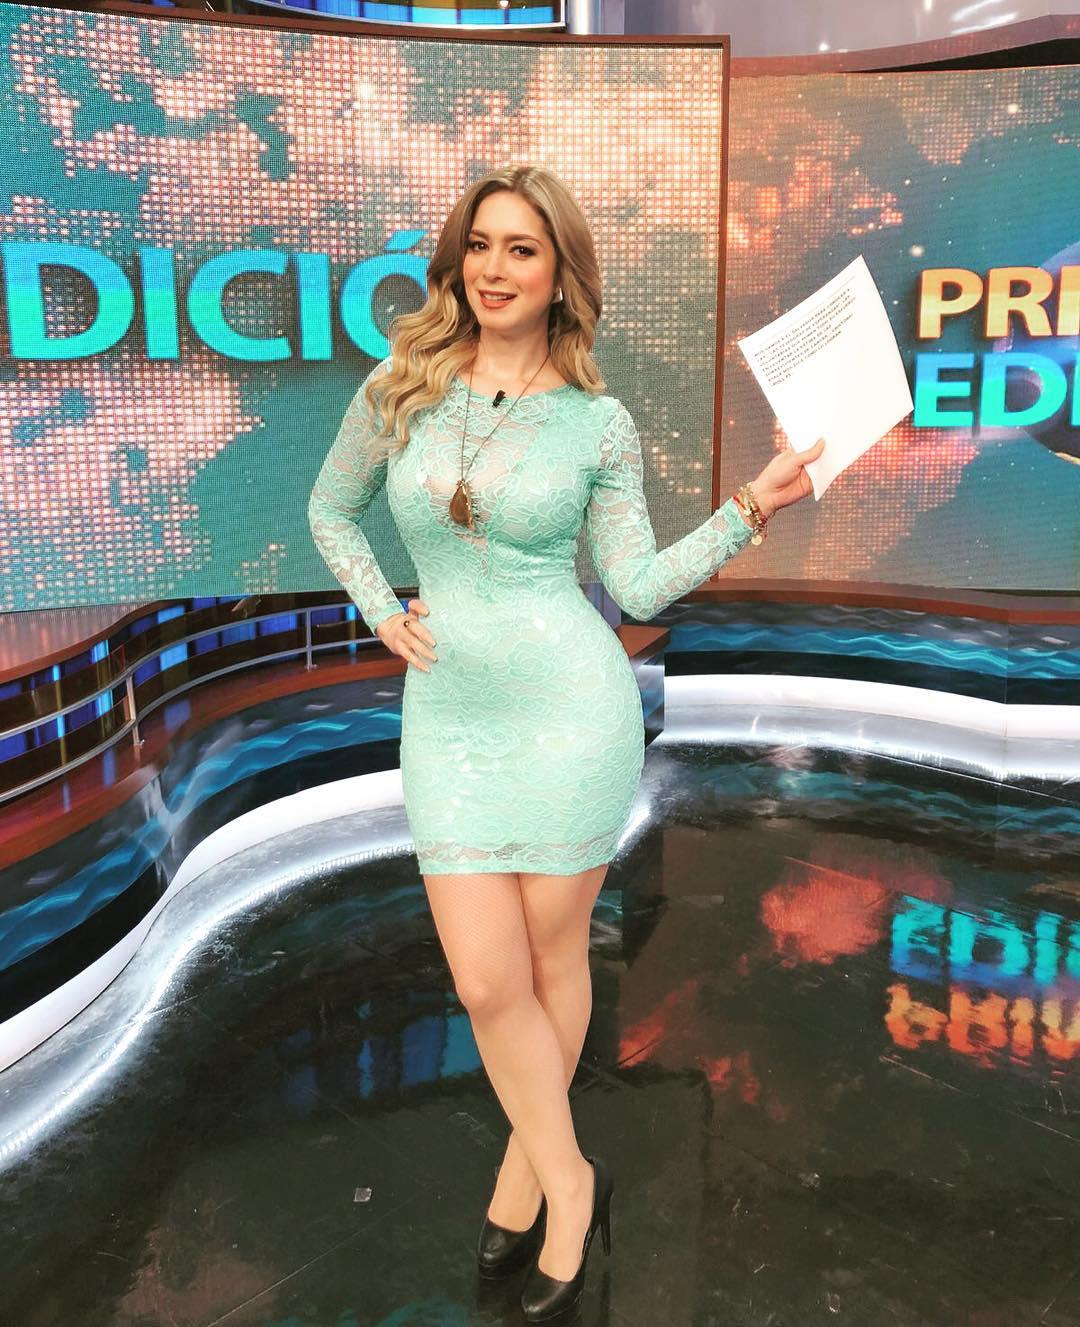 Anais Salazar Nude download sex pics anais salazar nude photos 2019 2020 hot